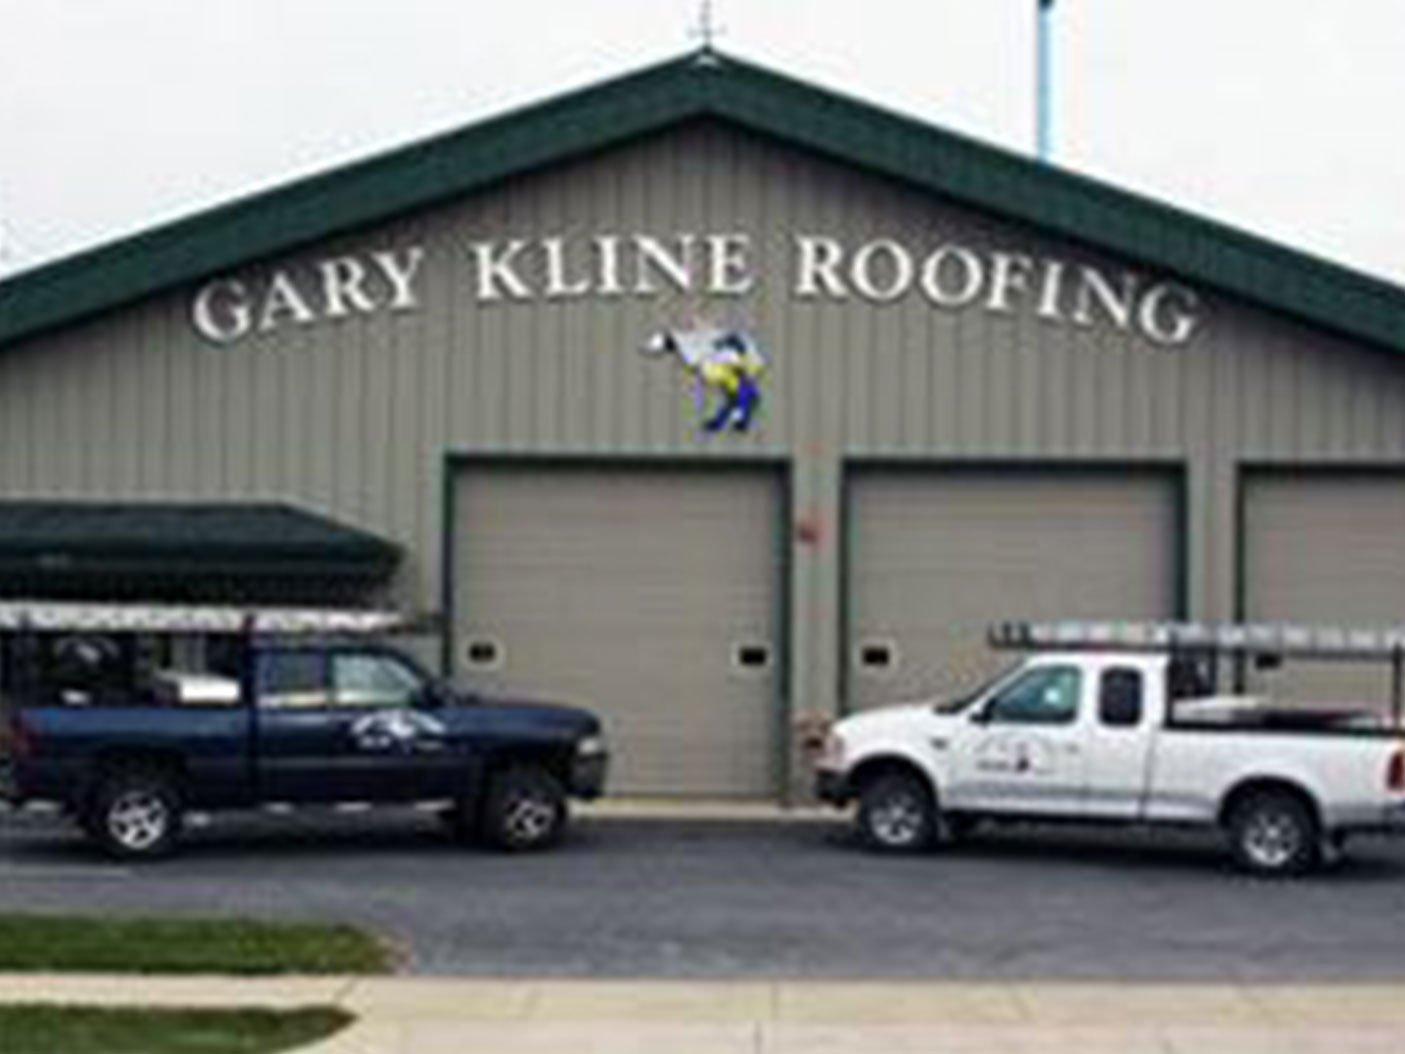 Gary Kline Roofing, Inc Store